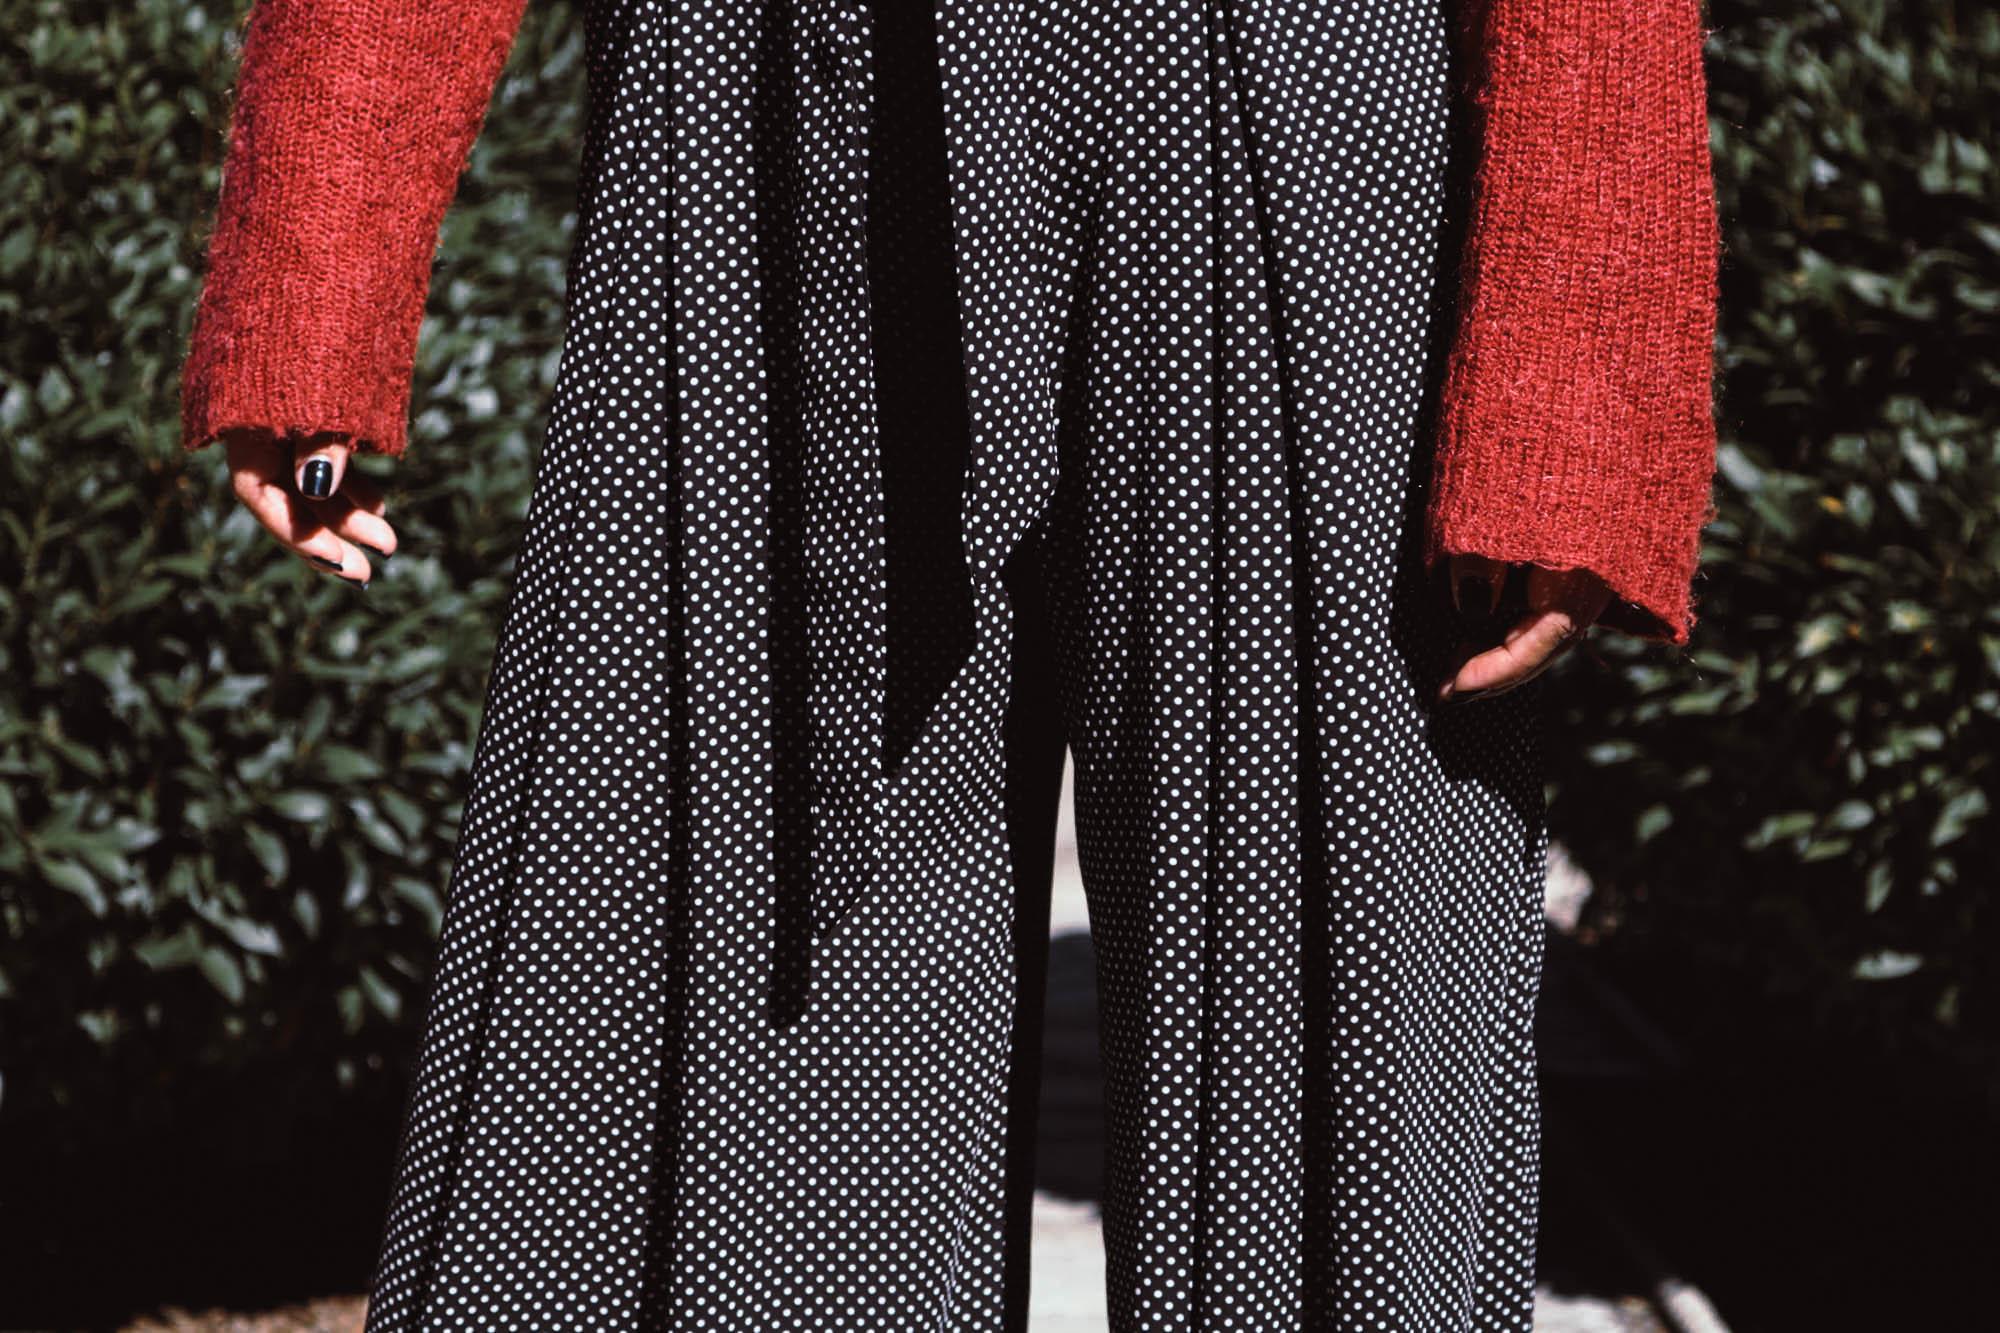 Outfit Details: Vintage Silk Houndstooth Scarf, NEM Fashion Sunglasses, Free People Turtleneck Sweater, Zara Polka Dot Wide Leg Pants, Vegan Leather White Boots